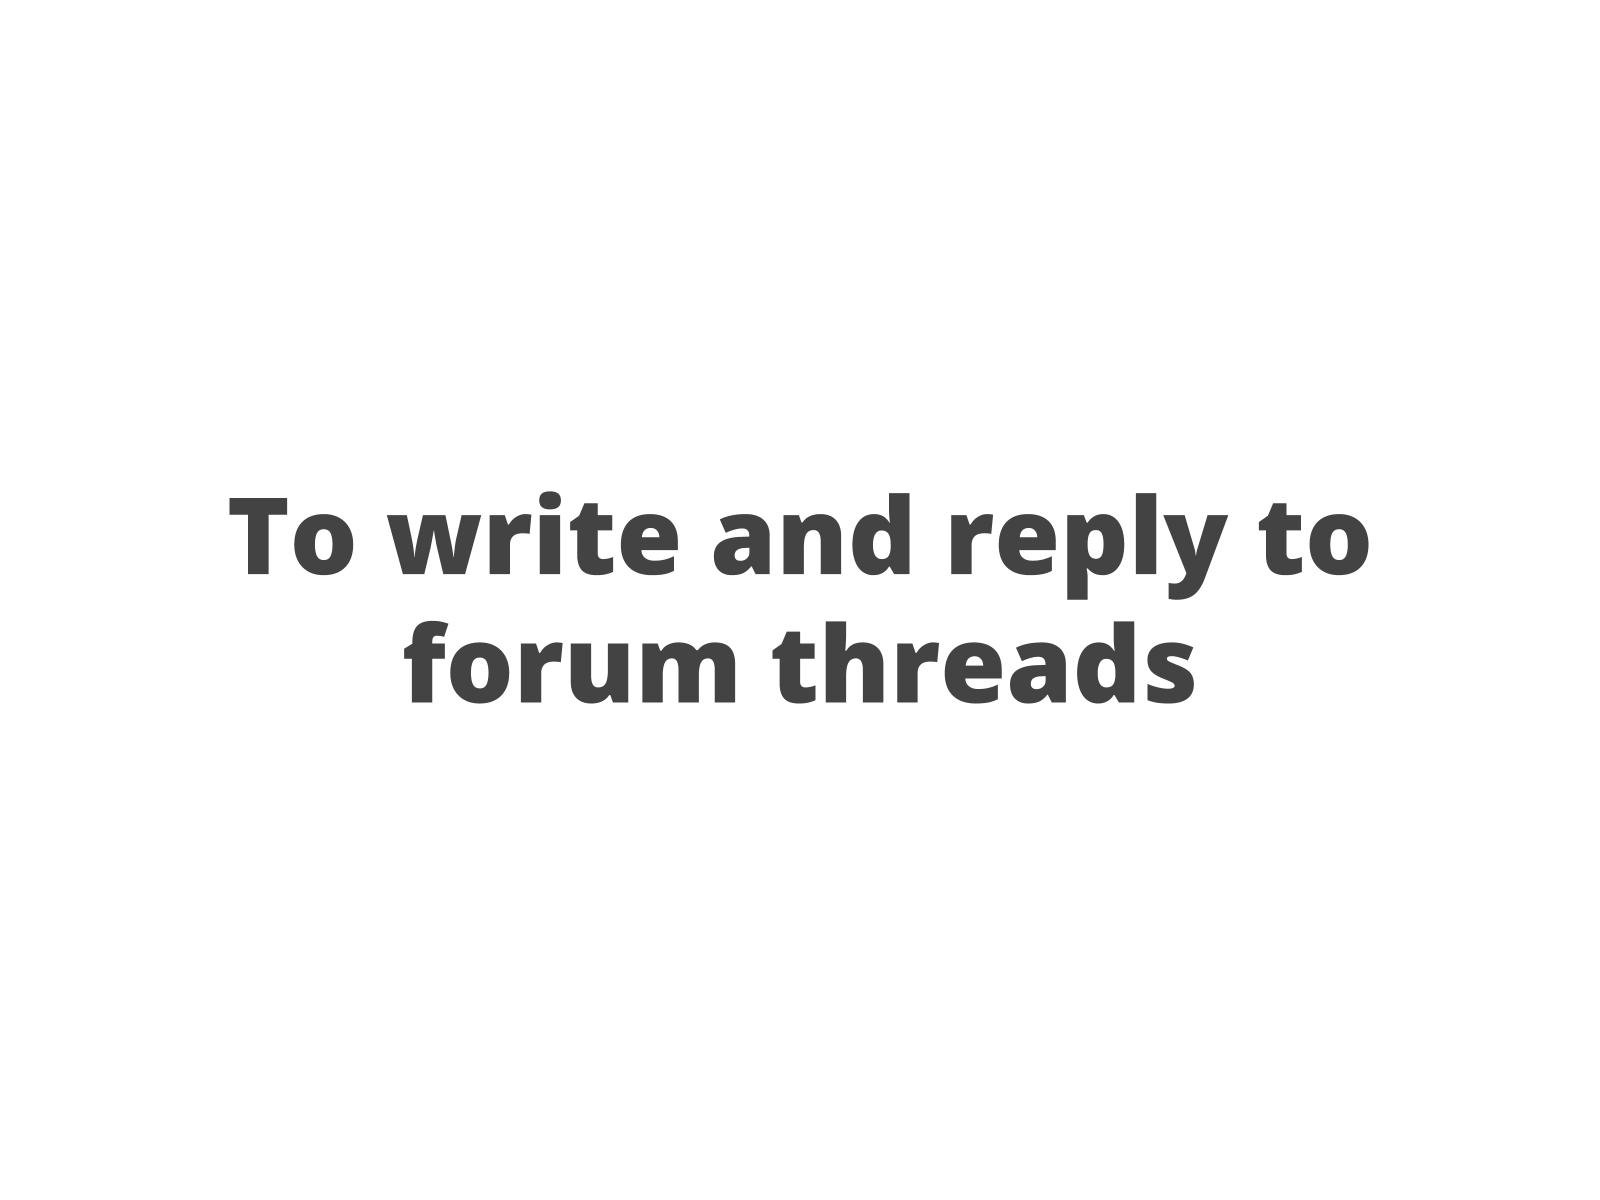 Postagem em fórum